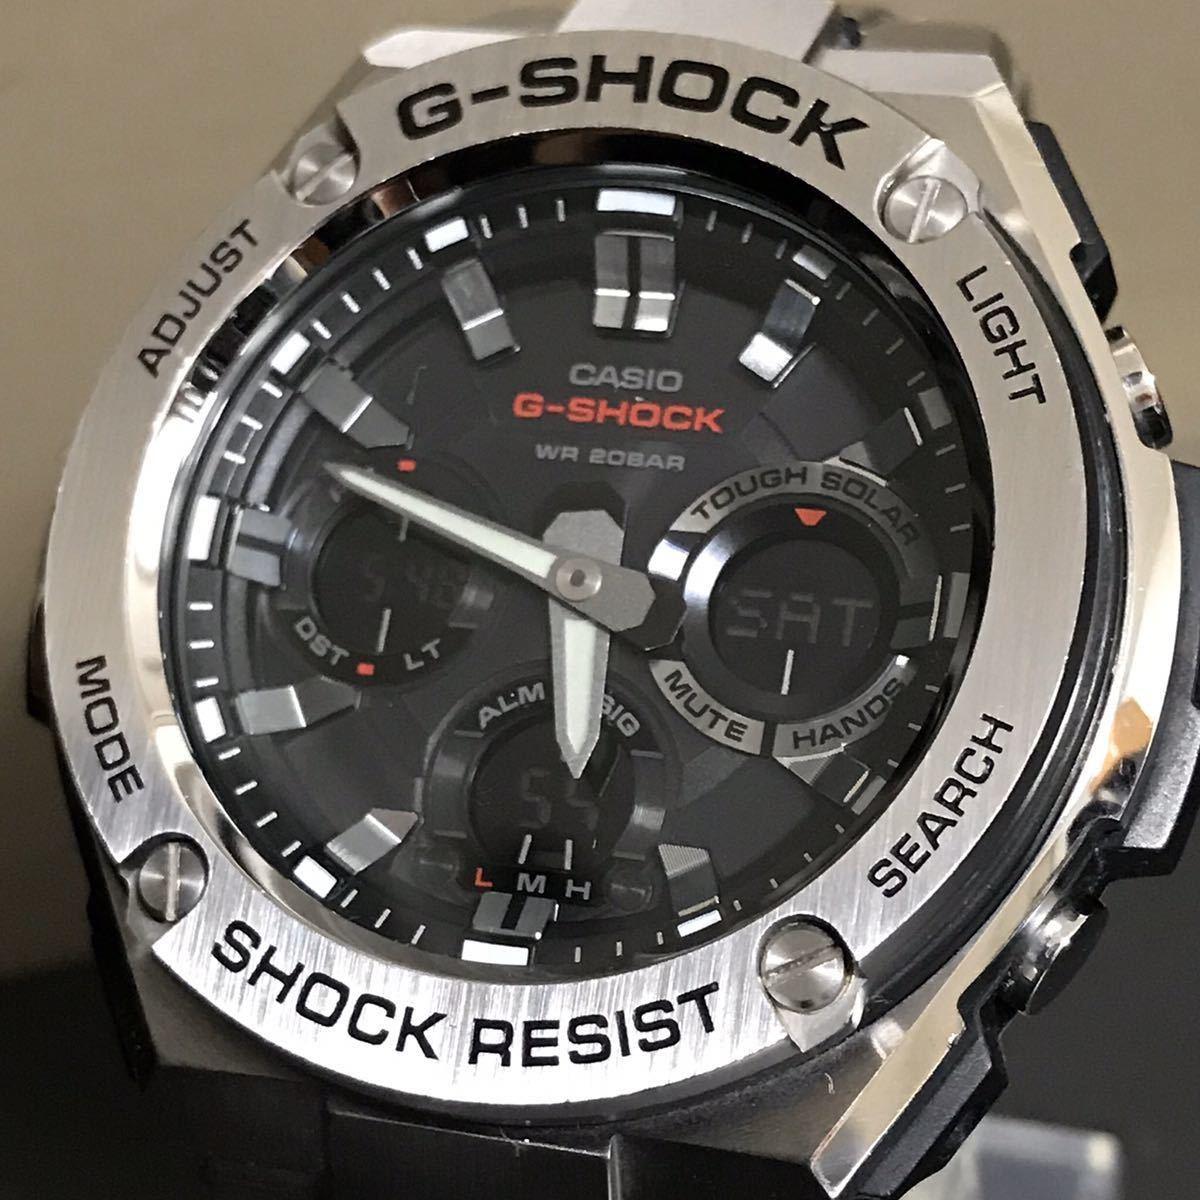 CASIO G-SHOCK GST-W110D-1AJF G-STEEL Gスチール タフソーラー 電波受信 電波ソーラー